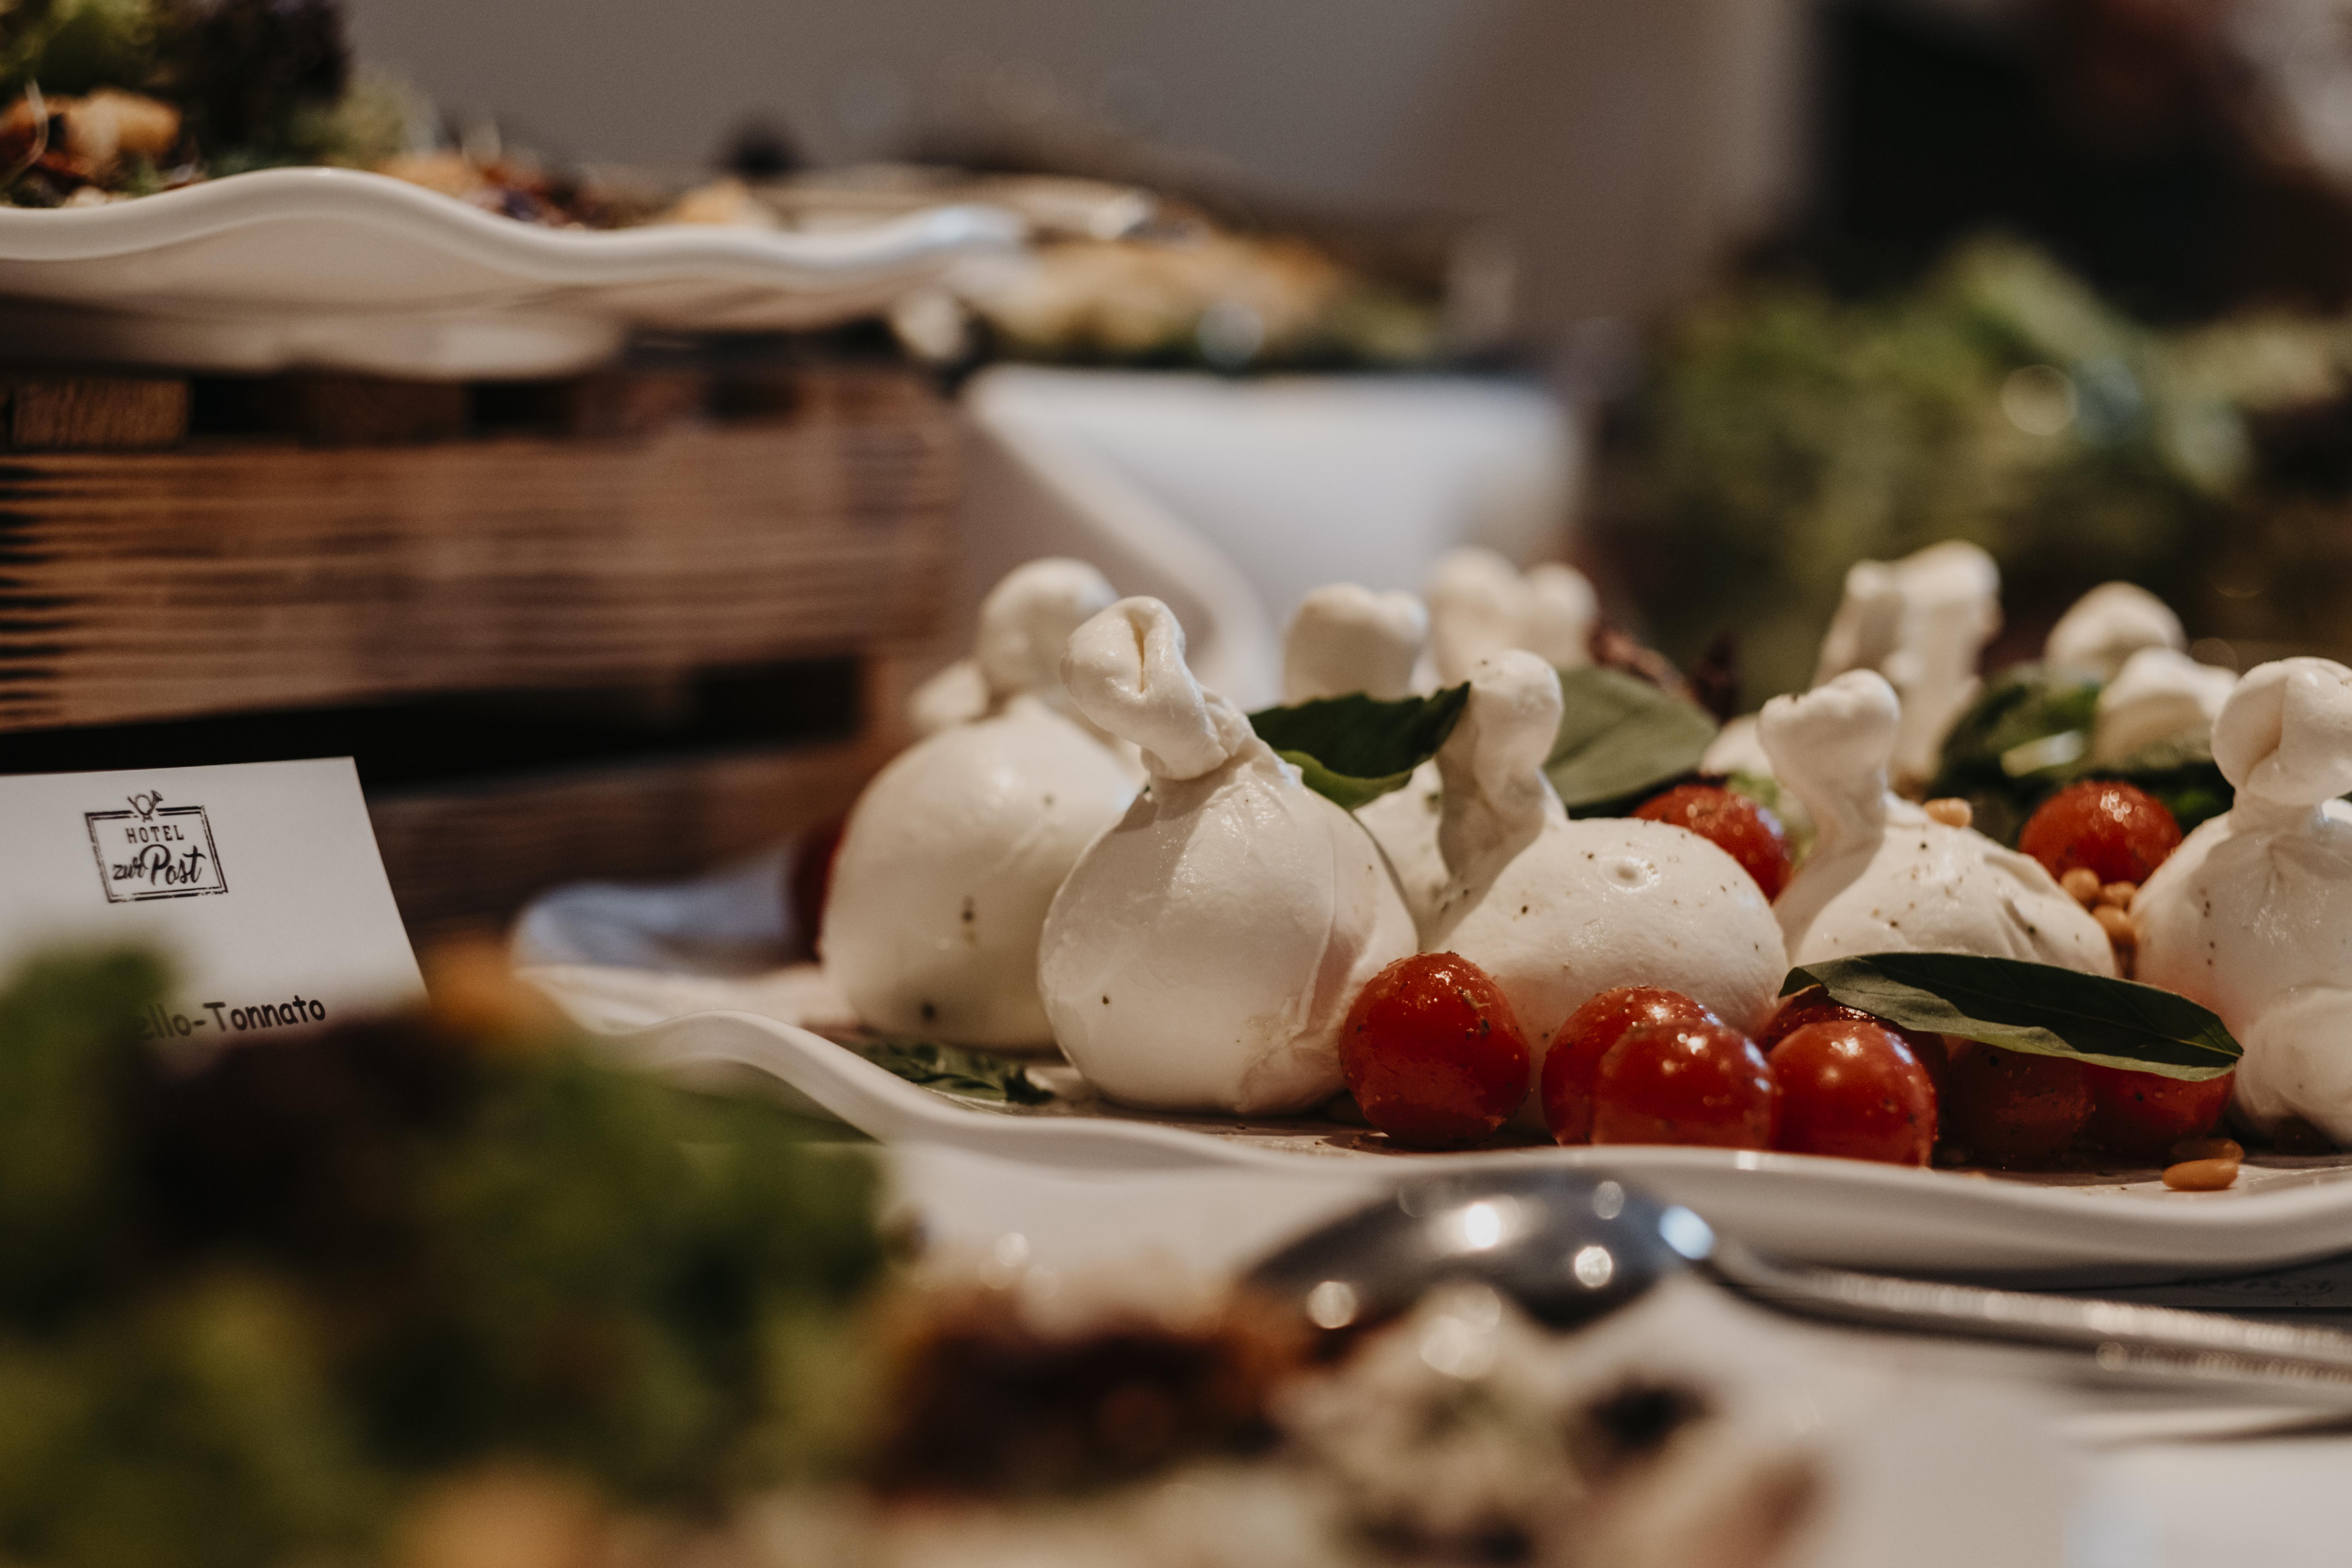 Tomate + Mozerrella